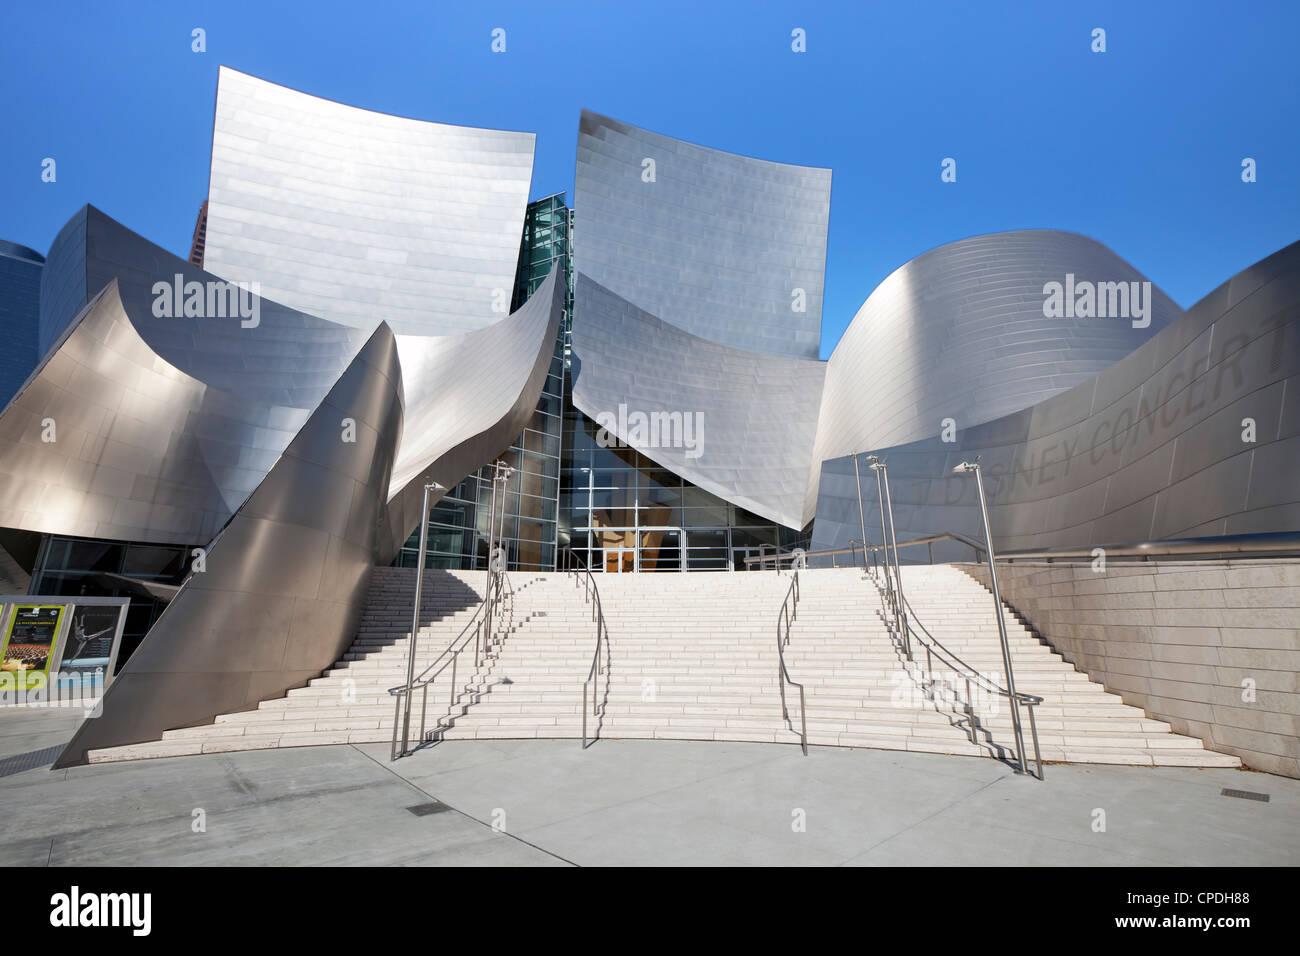 Walt Disney Concert Hall, Los Angeles, California, United States of America, North America Stock Photo